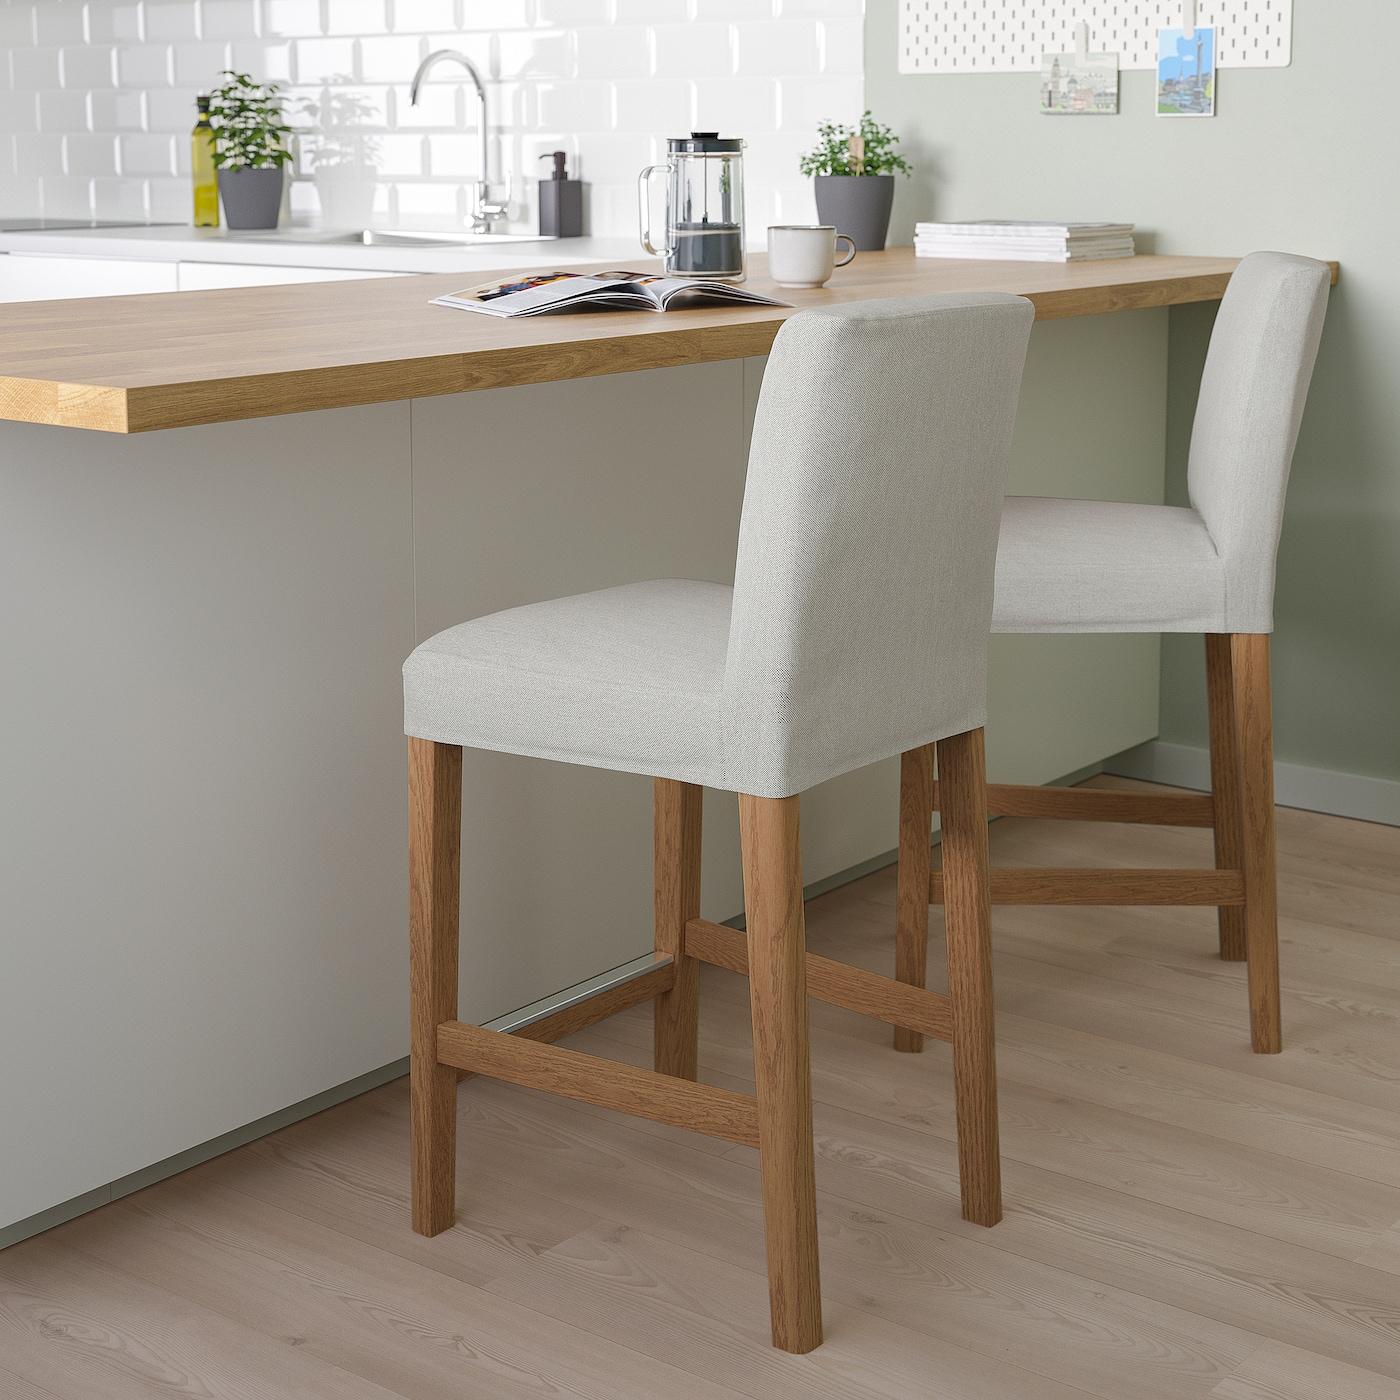 BERGMUND Bar stool with backrest   oak/Orrsta light grey   IKEA